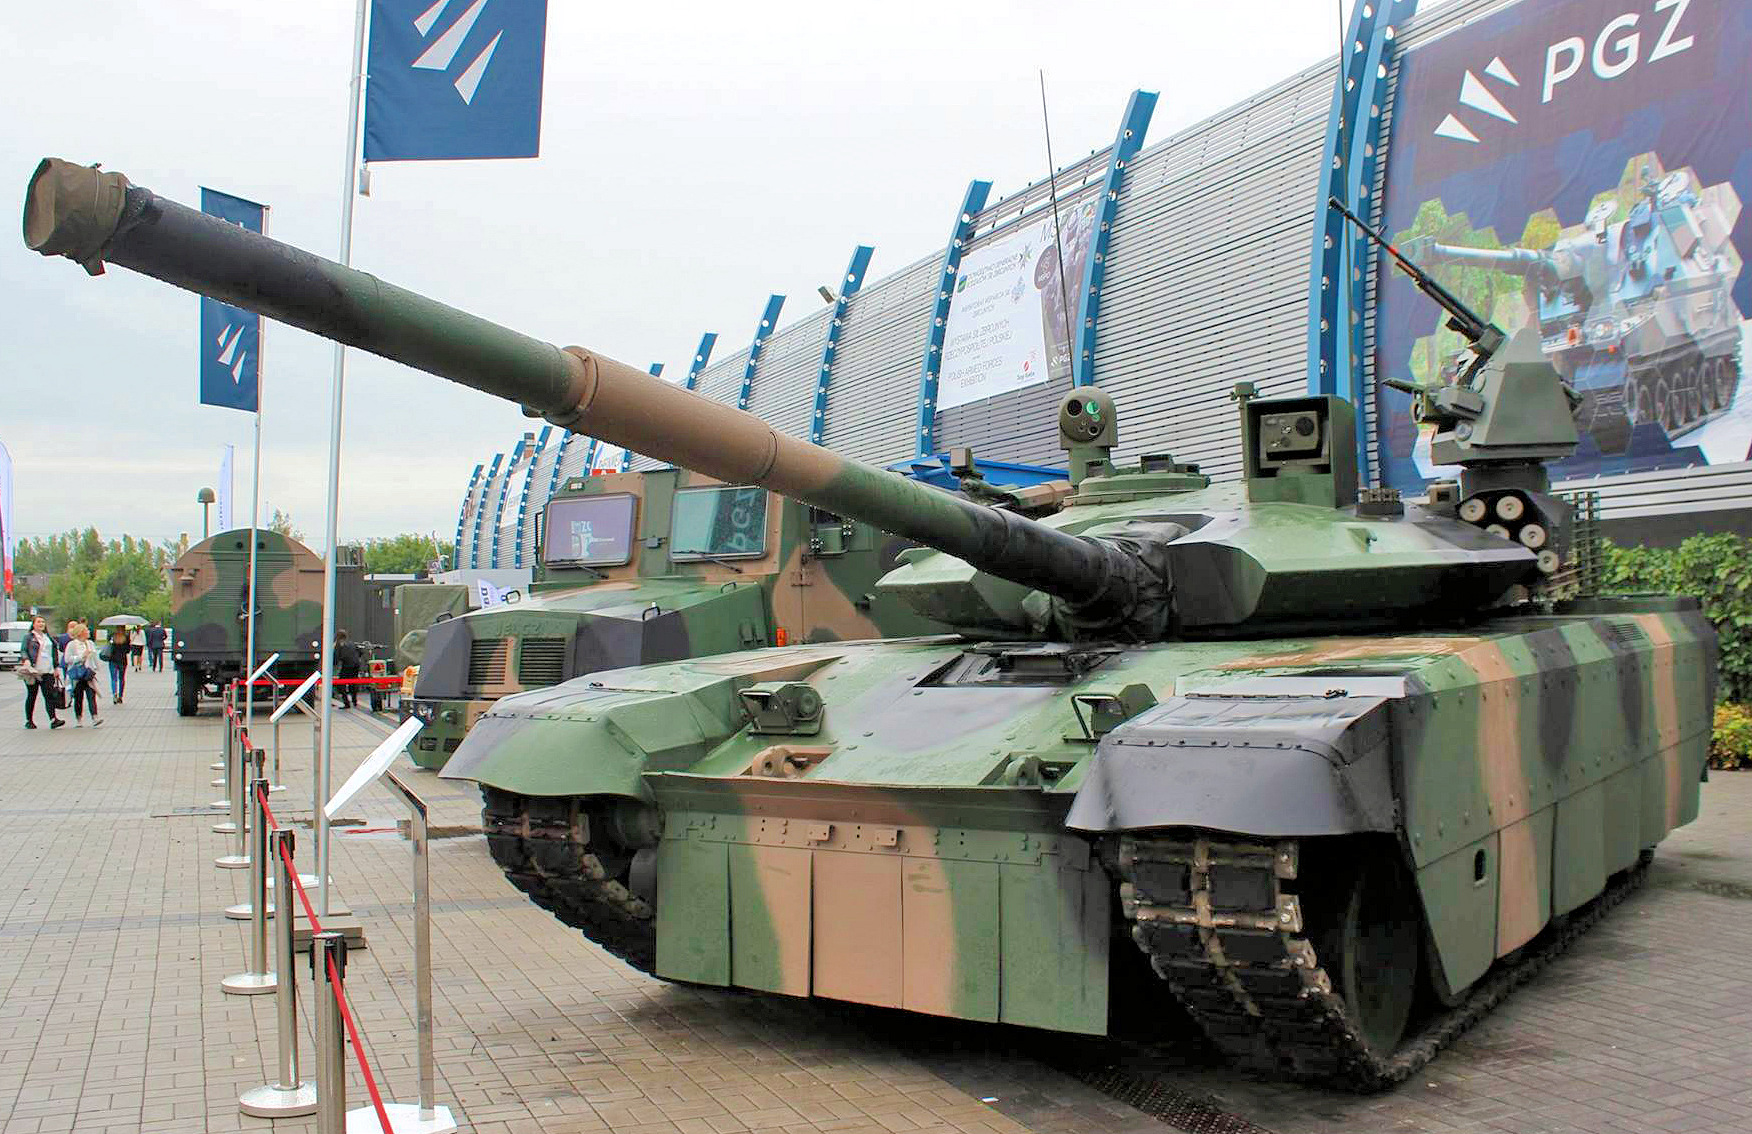 Ukraine's shield and sword: defense industry's main